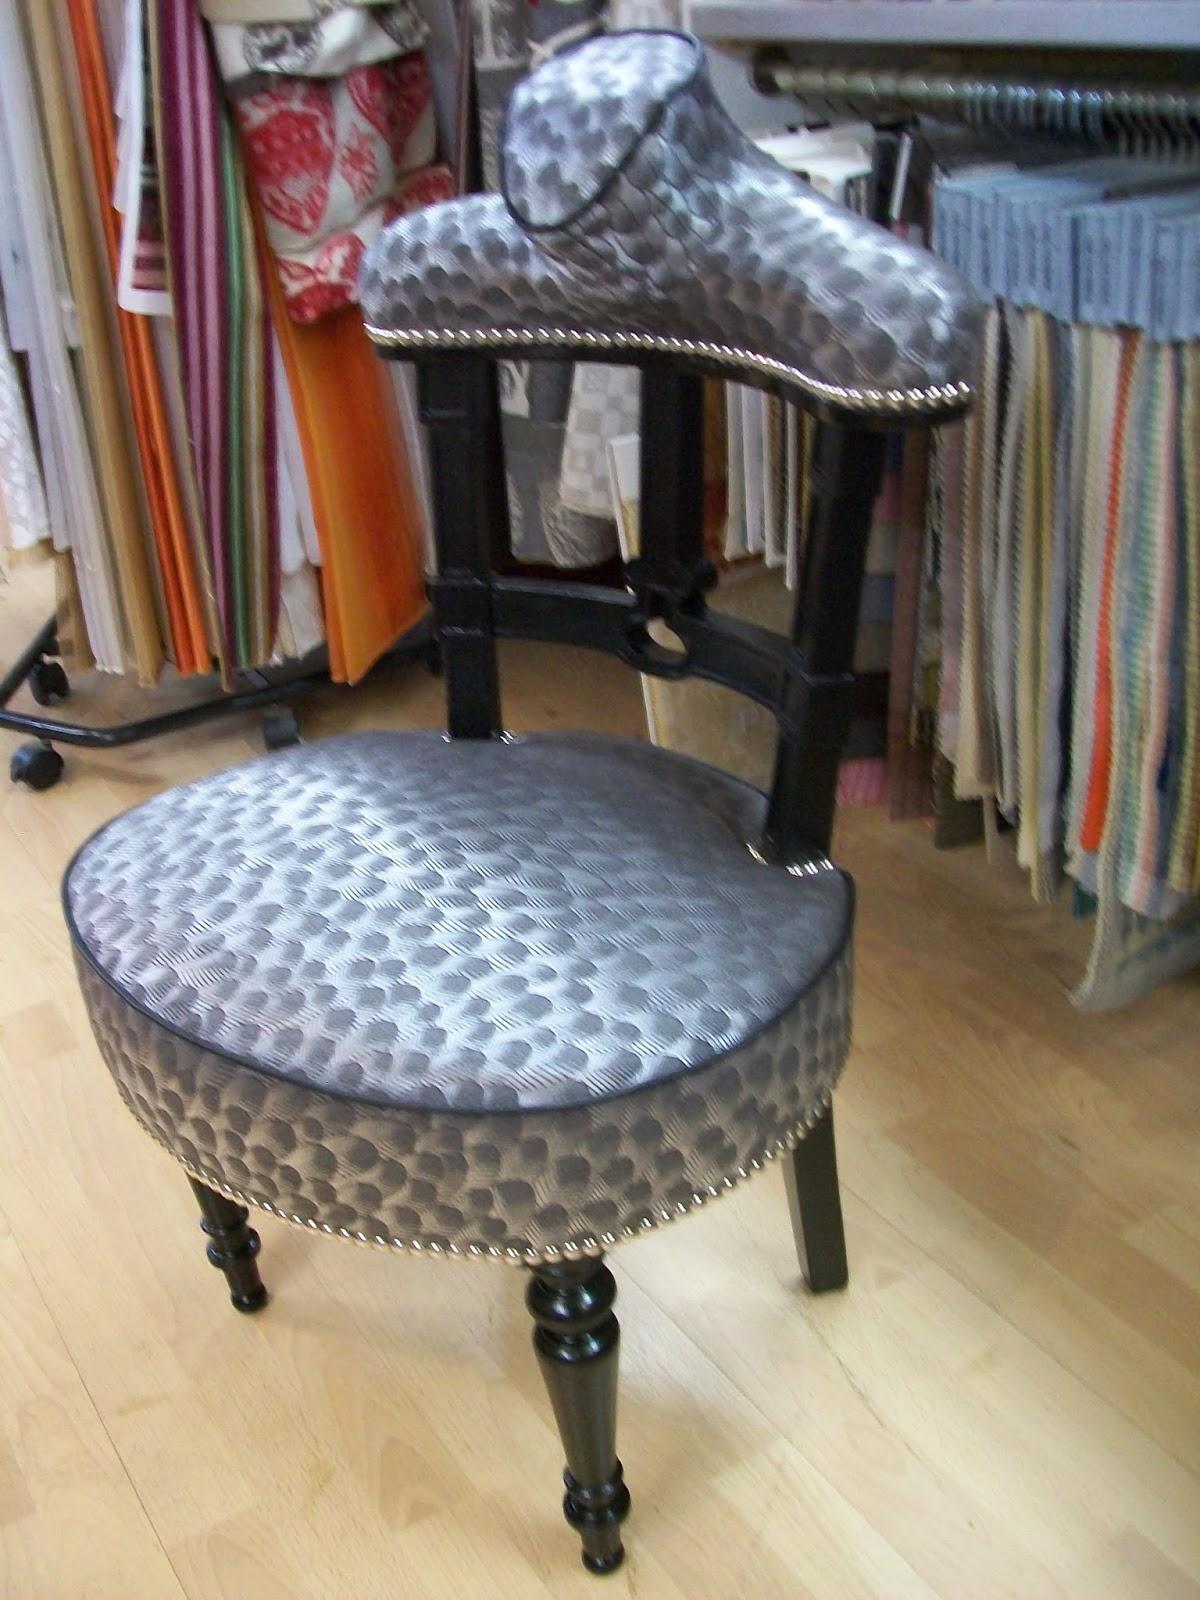 l 39 prie dieu revue en valet de chambre. Black Bedroom Furniture Sets. Home Design Ideas